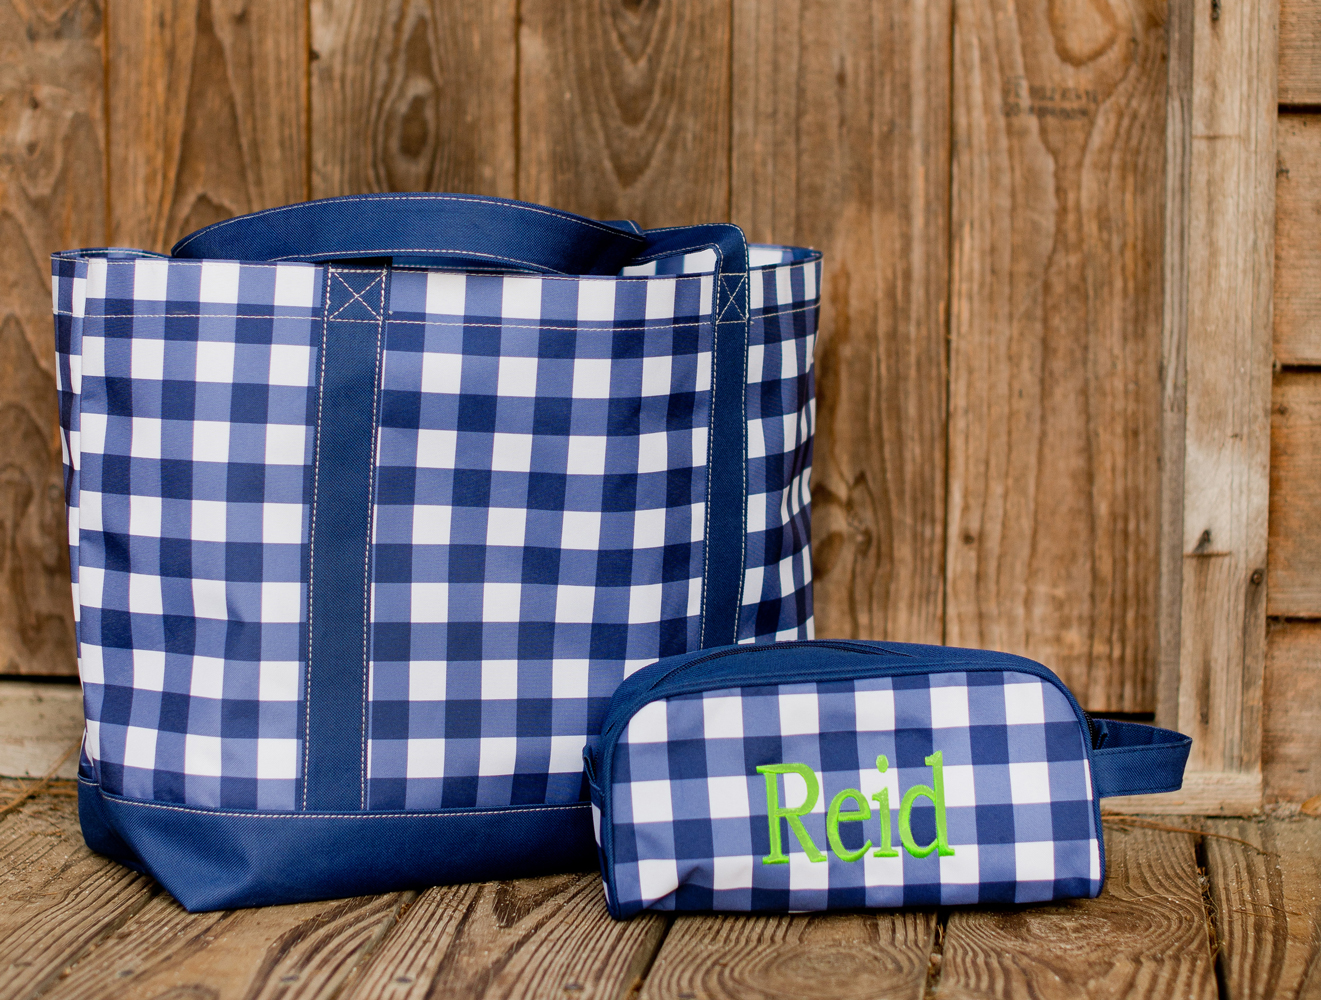 Monogram Tote Bag Navy Checks Bag Owen Tote Bag Navy